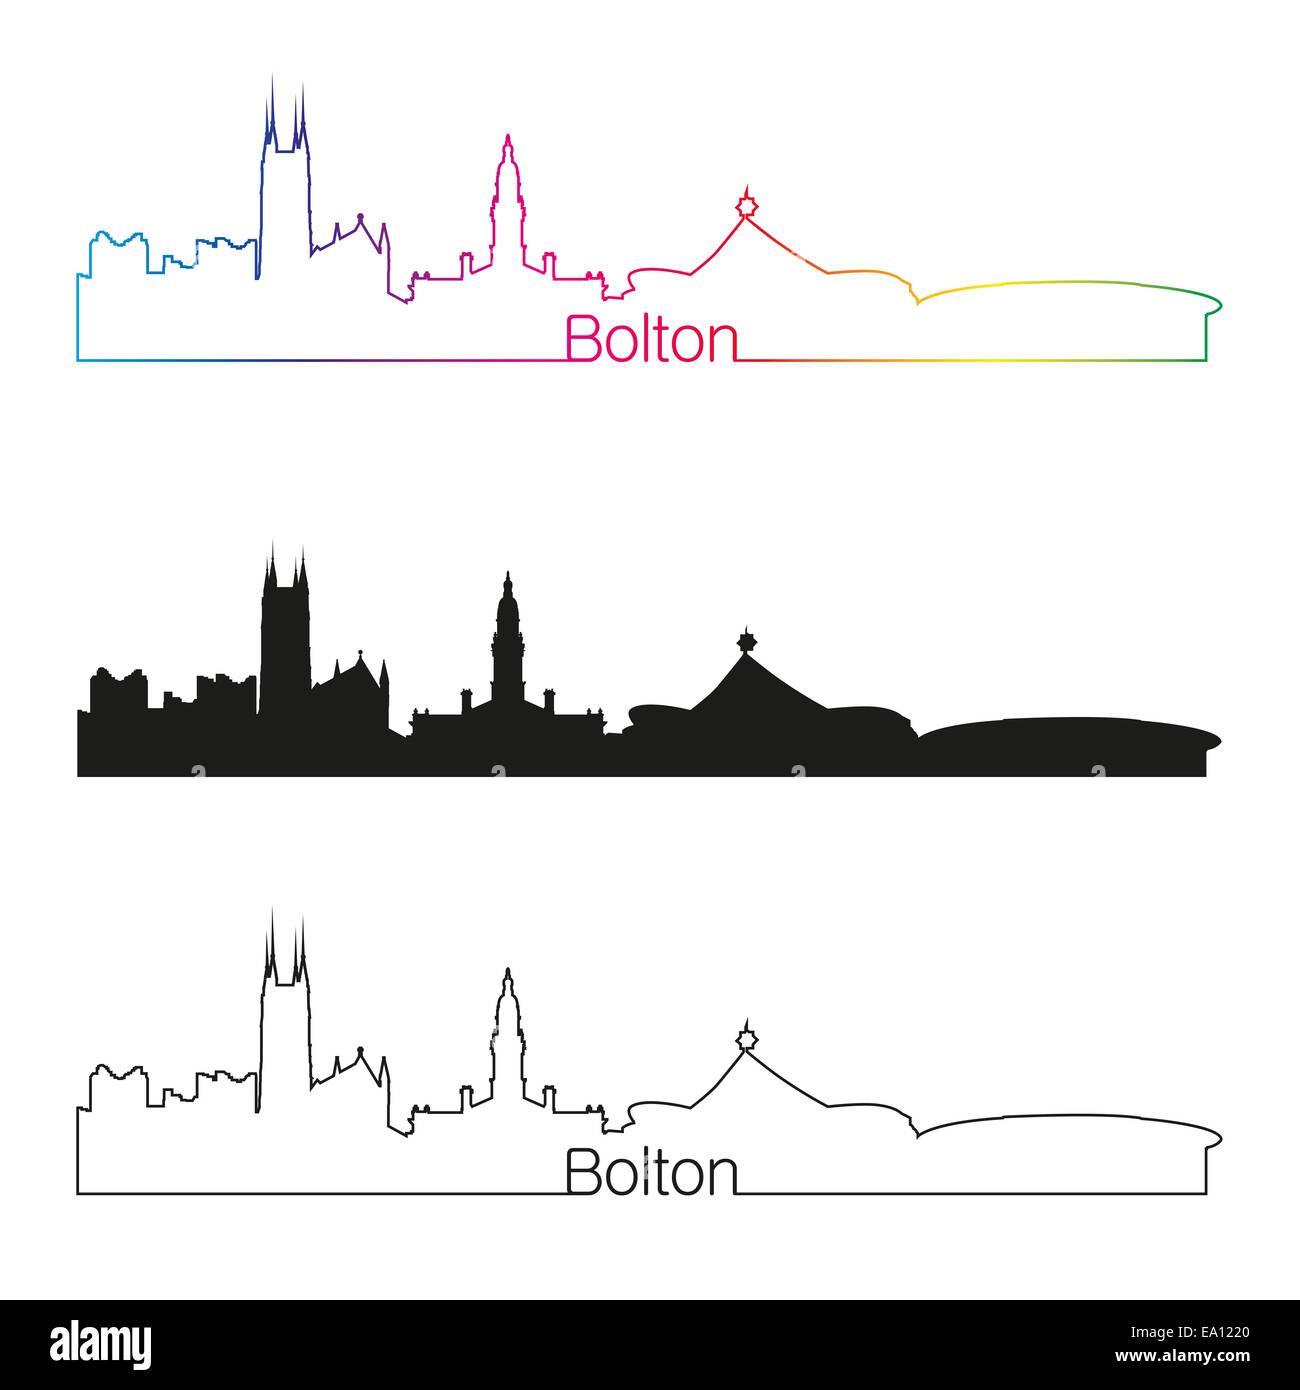 Bolton skyline linear - Stock Image